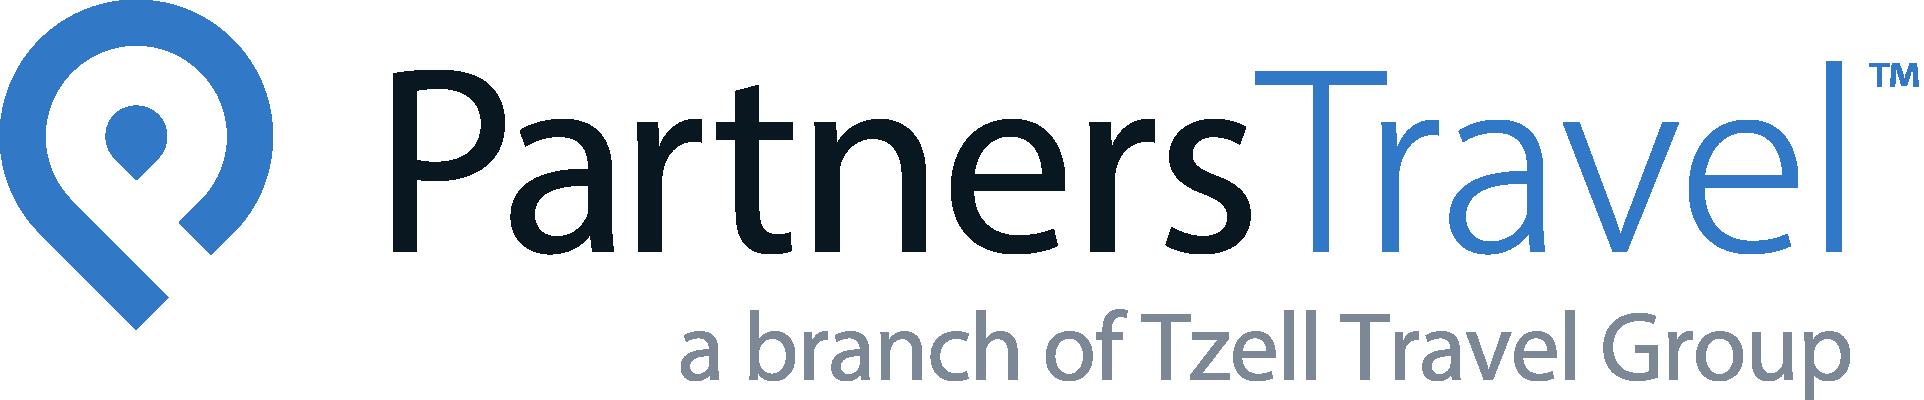 Partners Travel Management's Logo